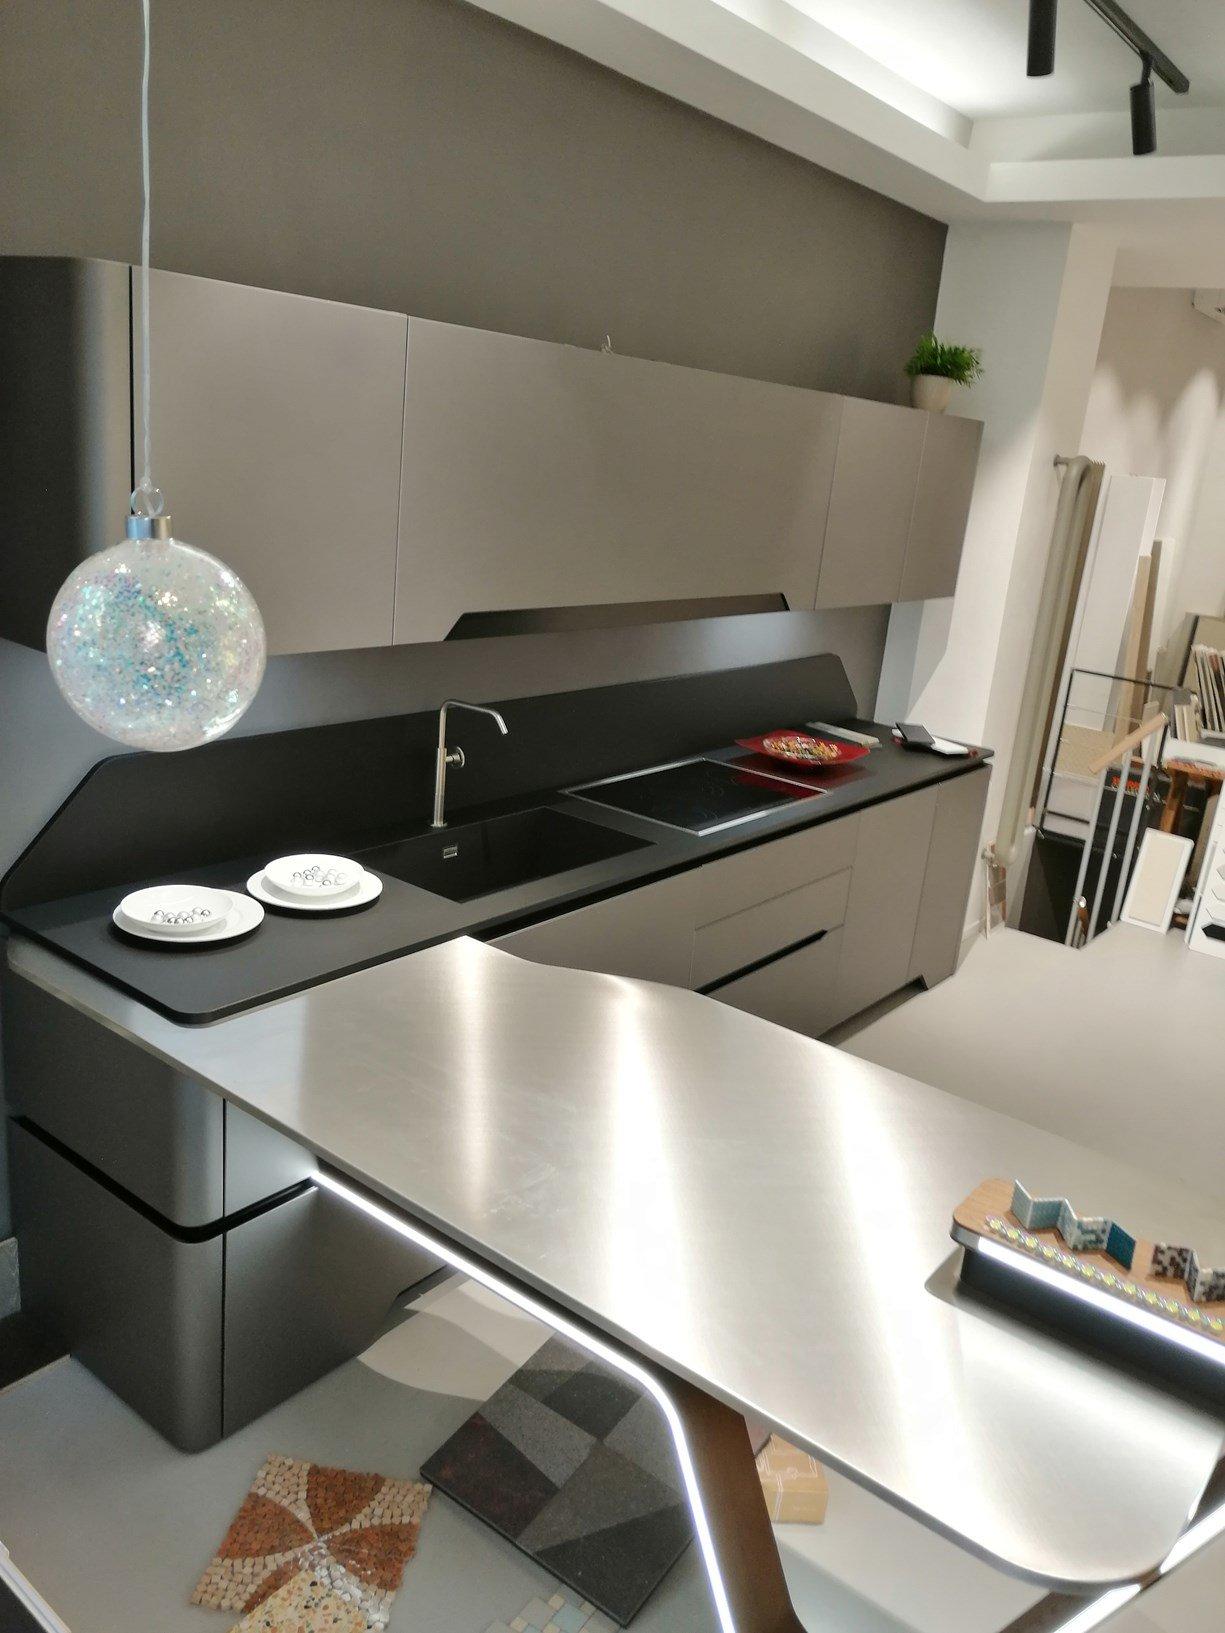 Cucina Snaidero Vision con penisola in acciaio